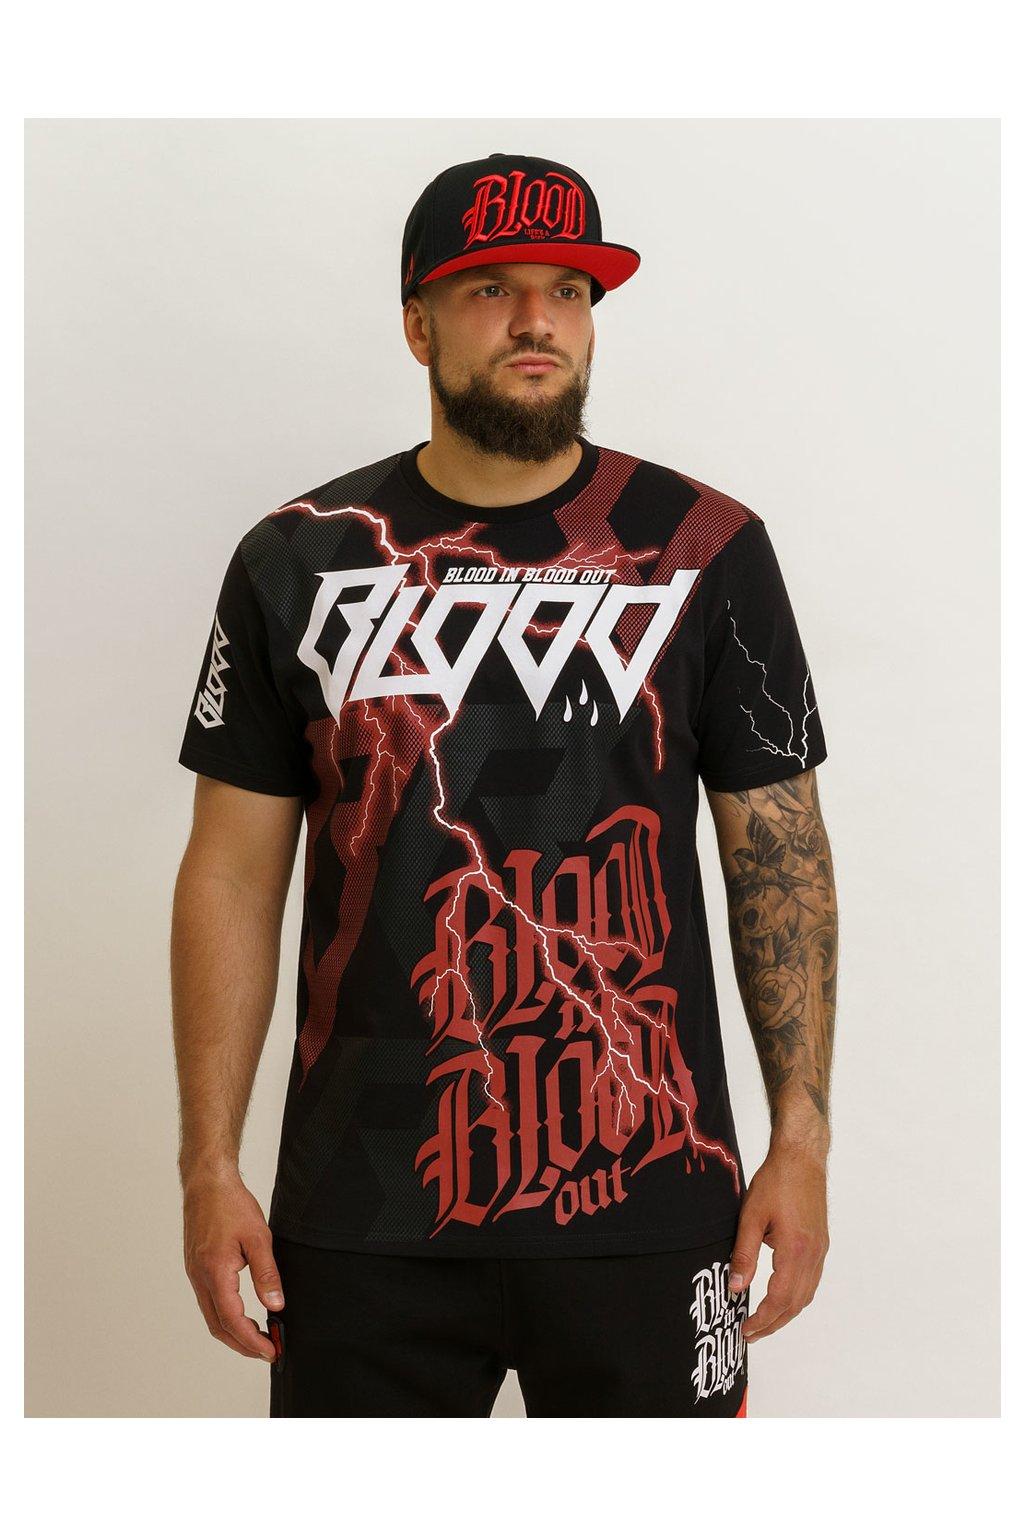 Blood In Blood Out Bonco pánské triko obr1